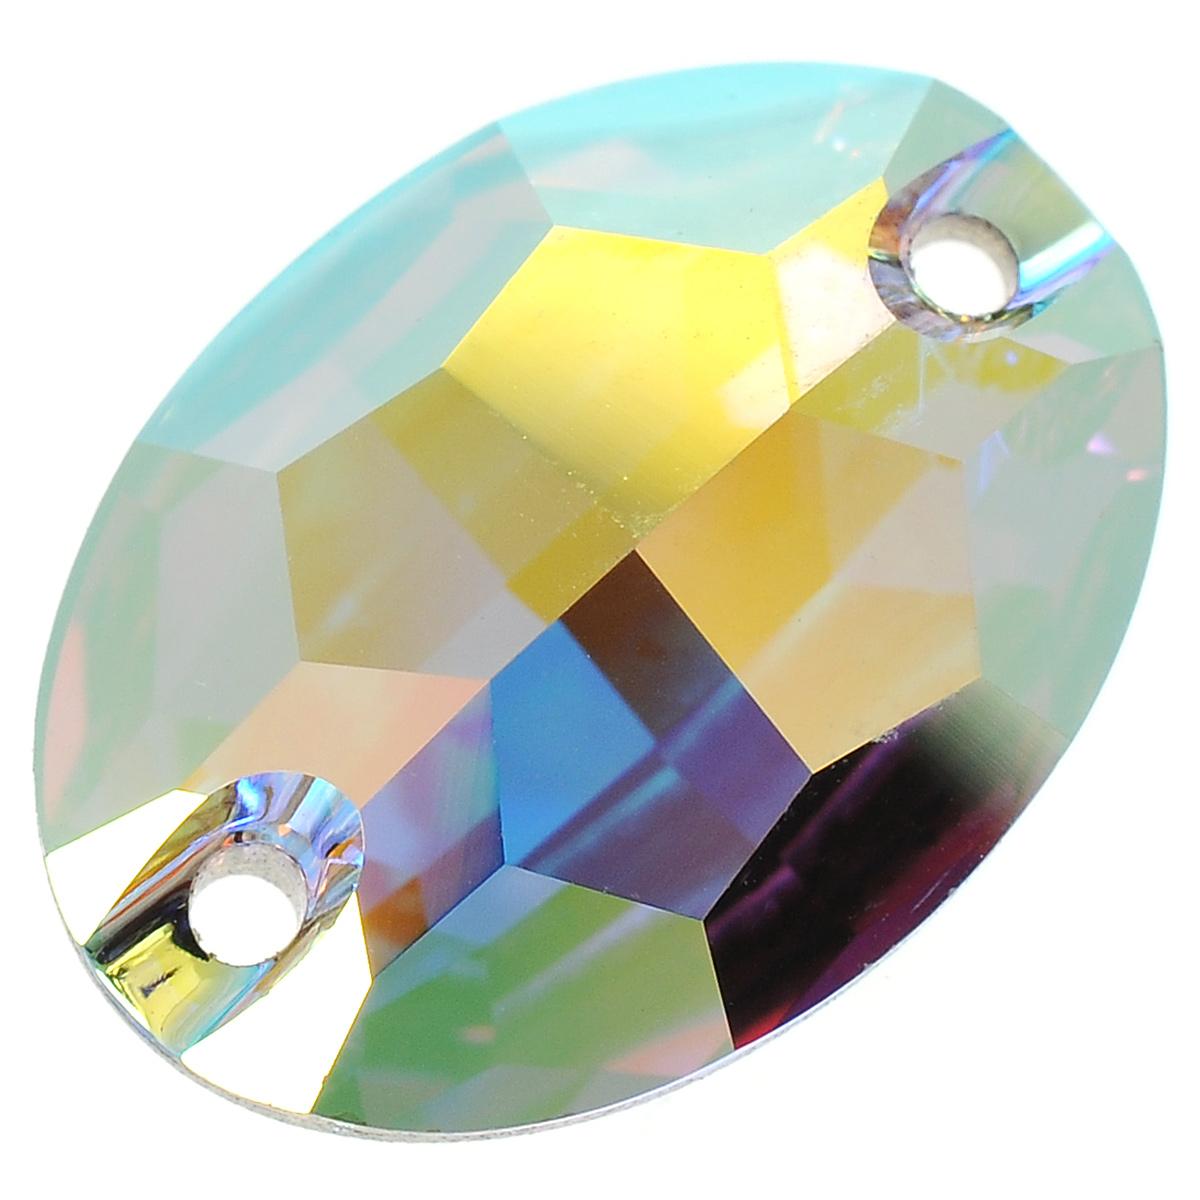 Камень нашивной Swarovski Elements, 16 х 11 мм zu elements zu003emnsw70